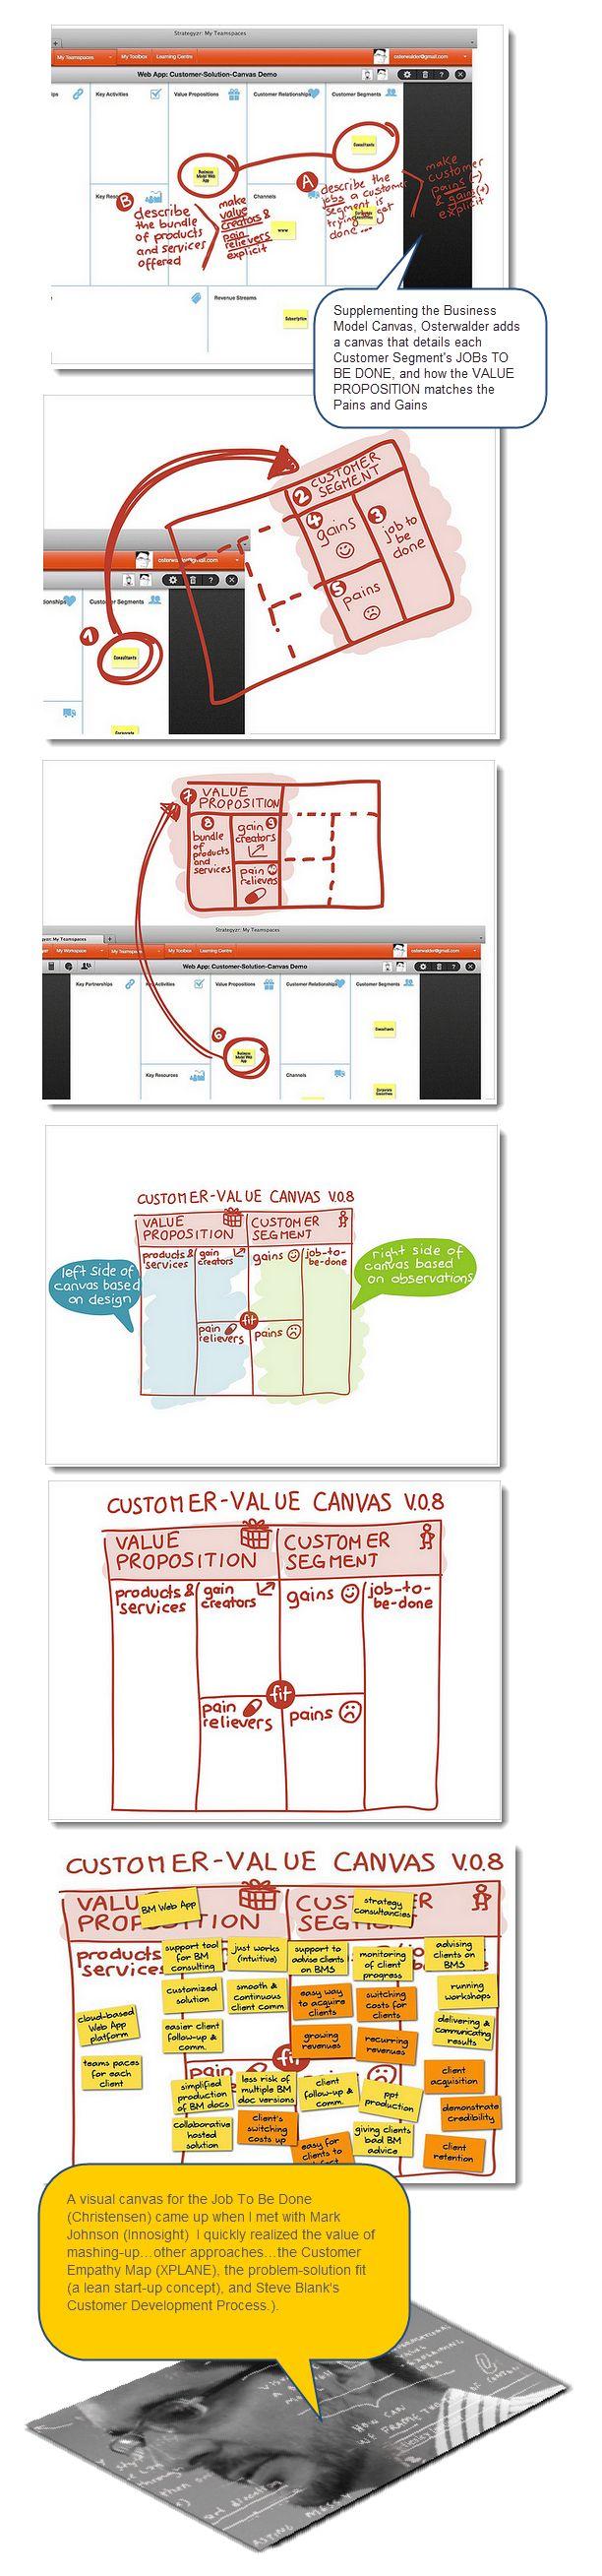 Best Business Model Startup Images On Pinterest Business - Unique business model template concept